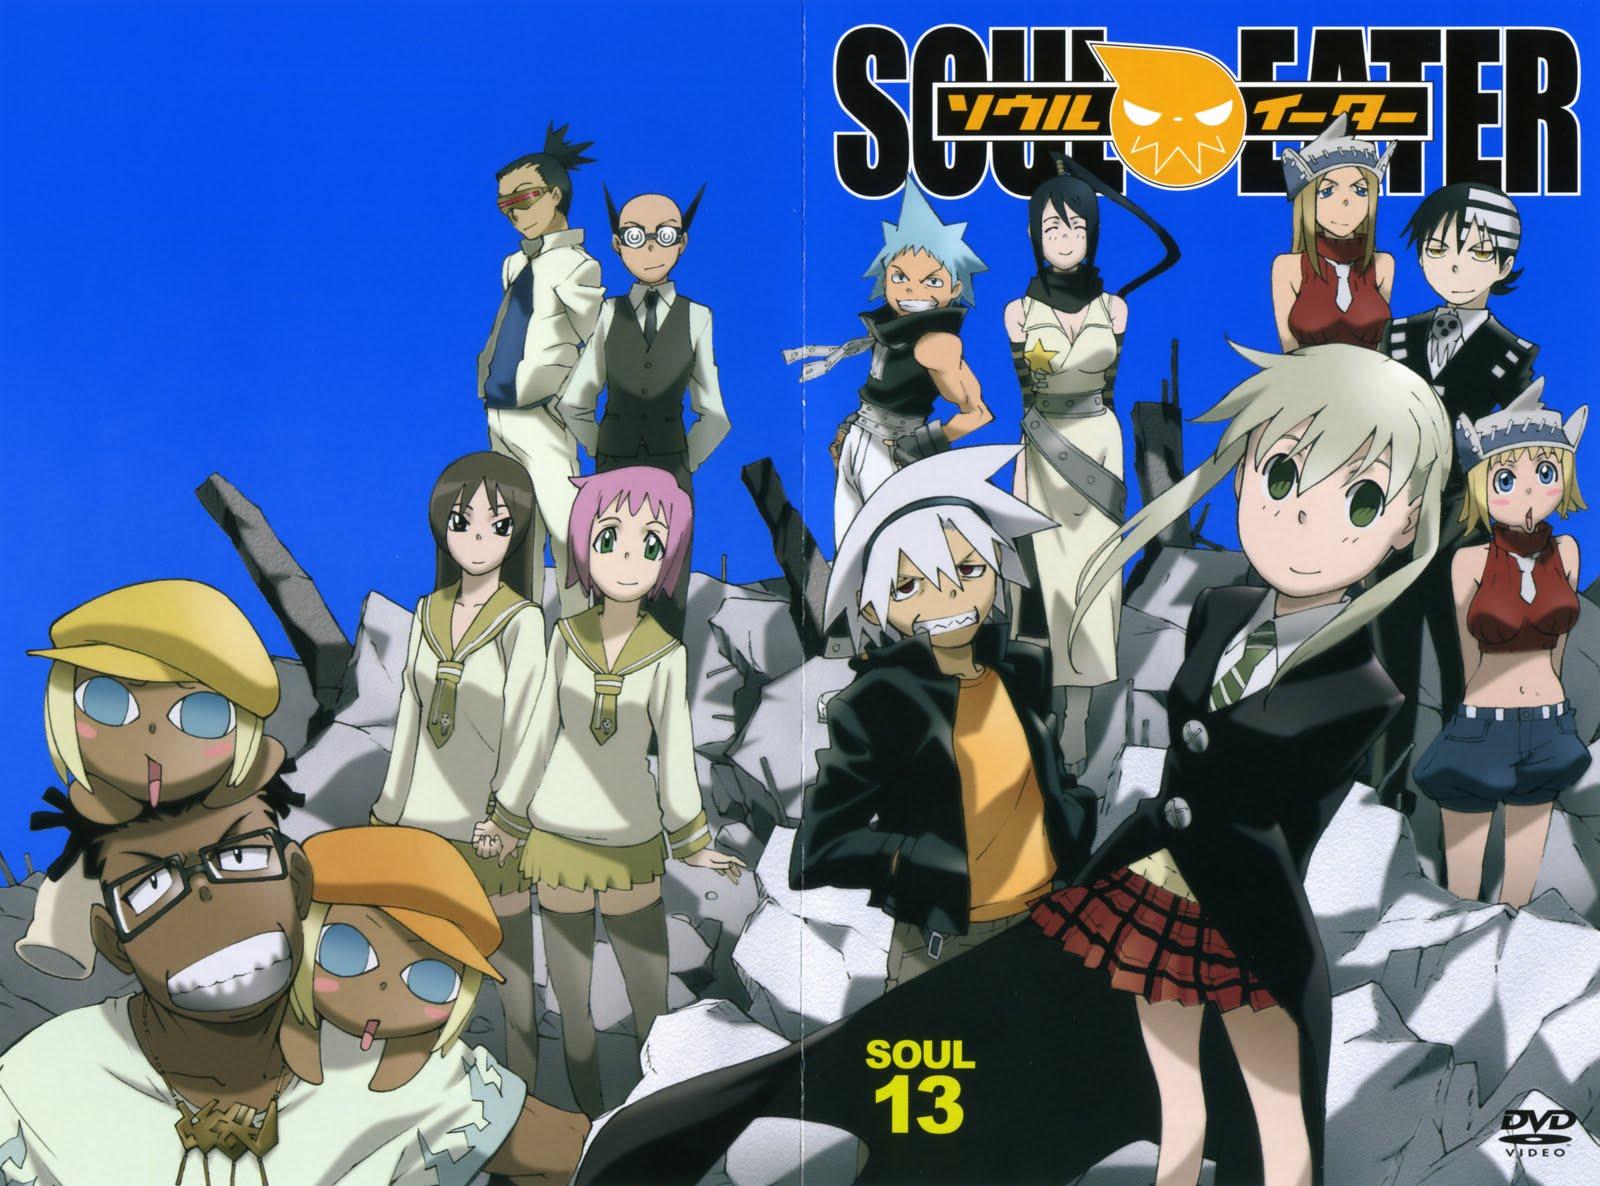 New Soul Eater 28 Desktop Background